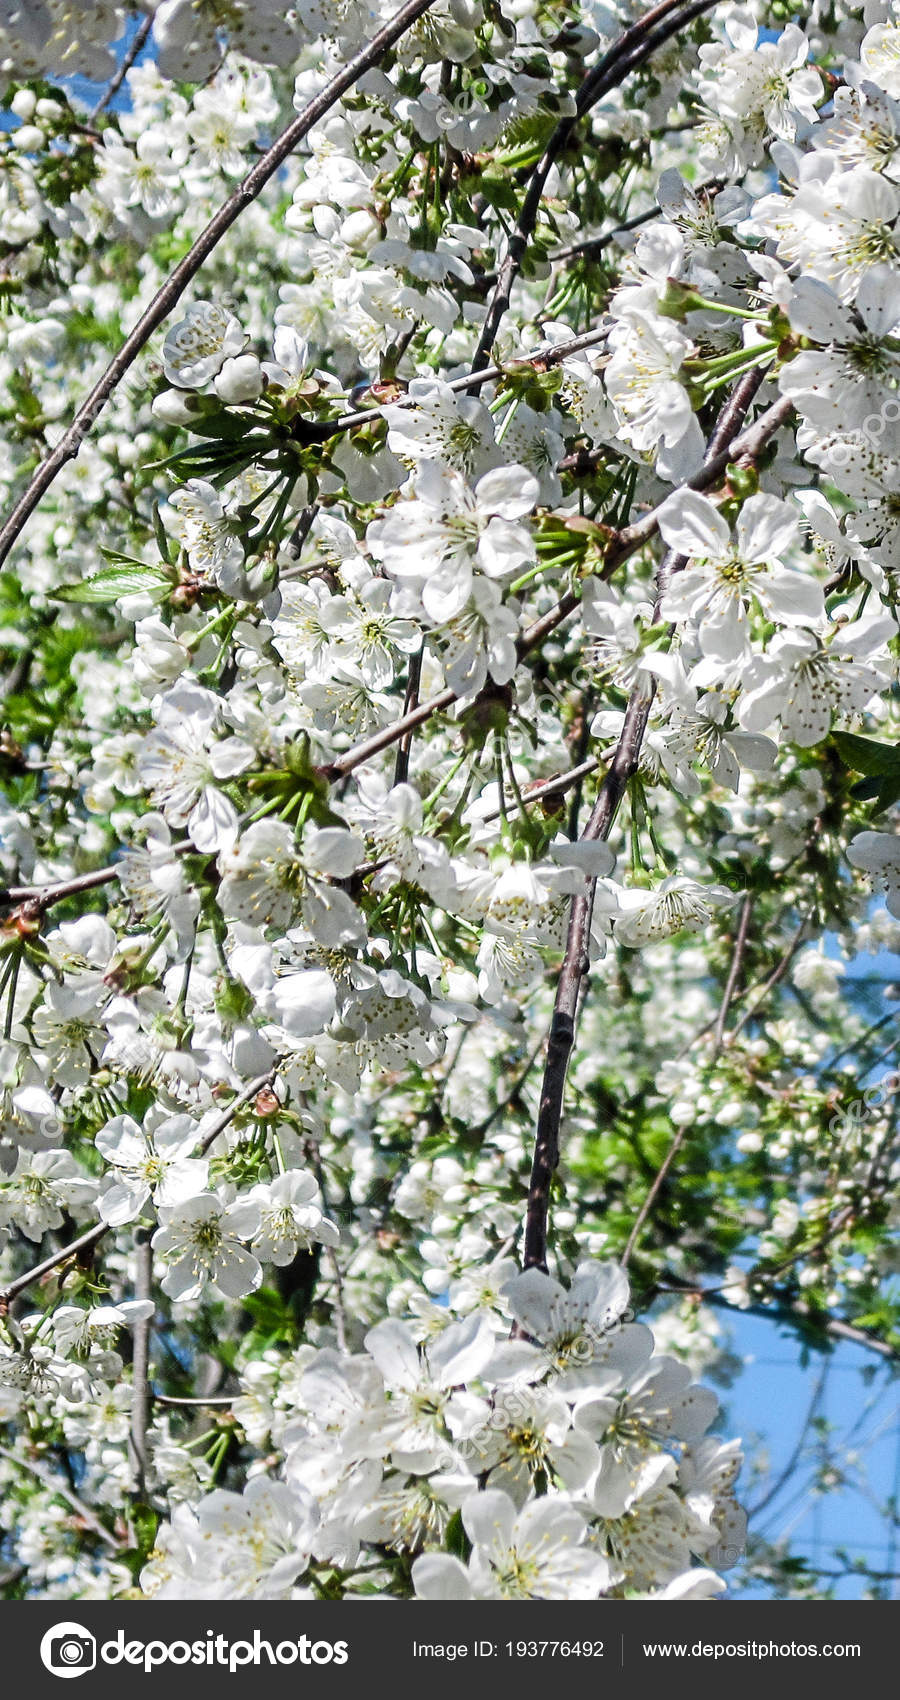 Blossom Bloom Cherry Sakura White Flowers Blooming Tree Branches Sky